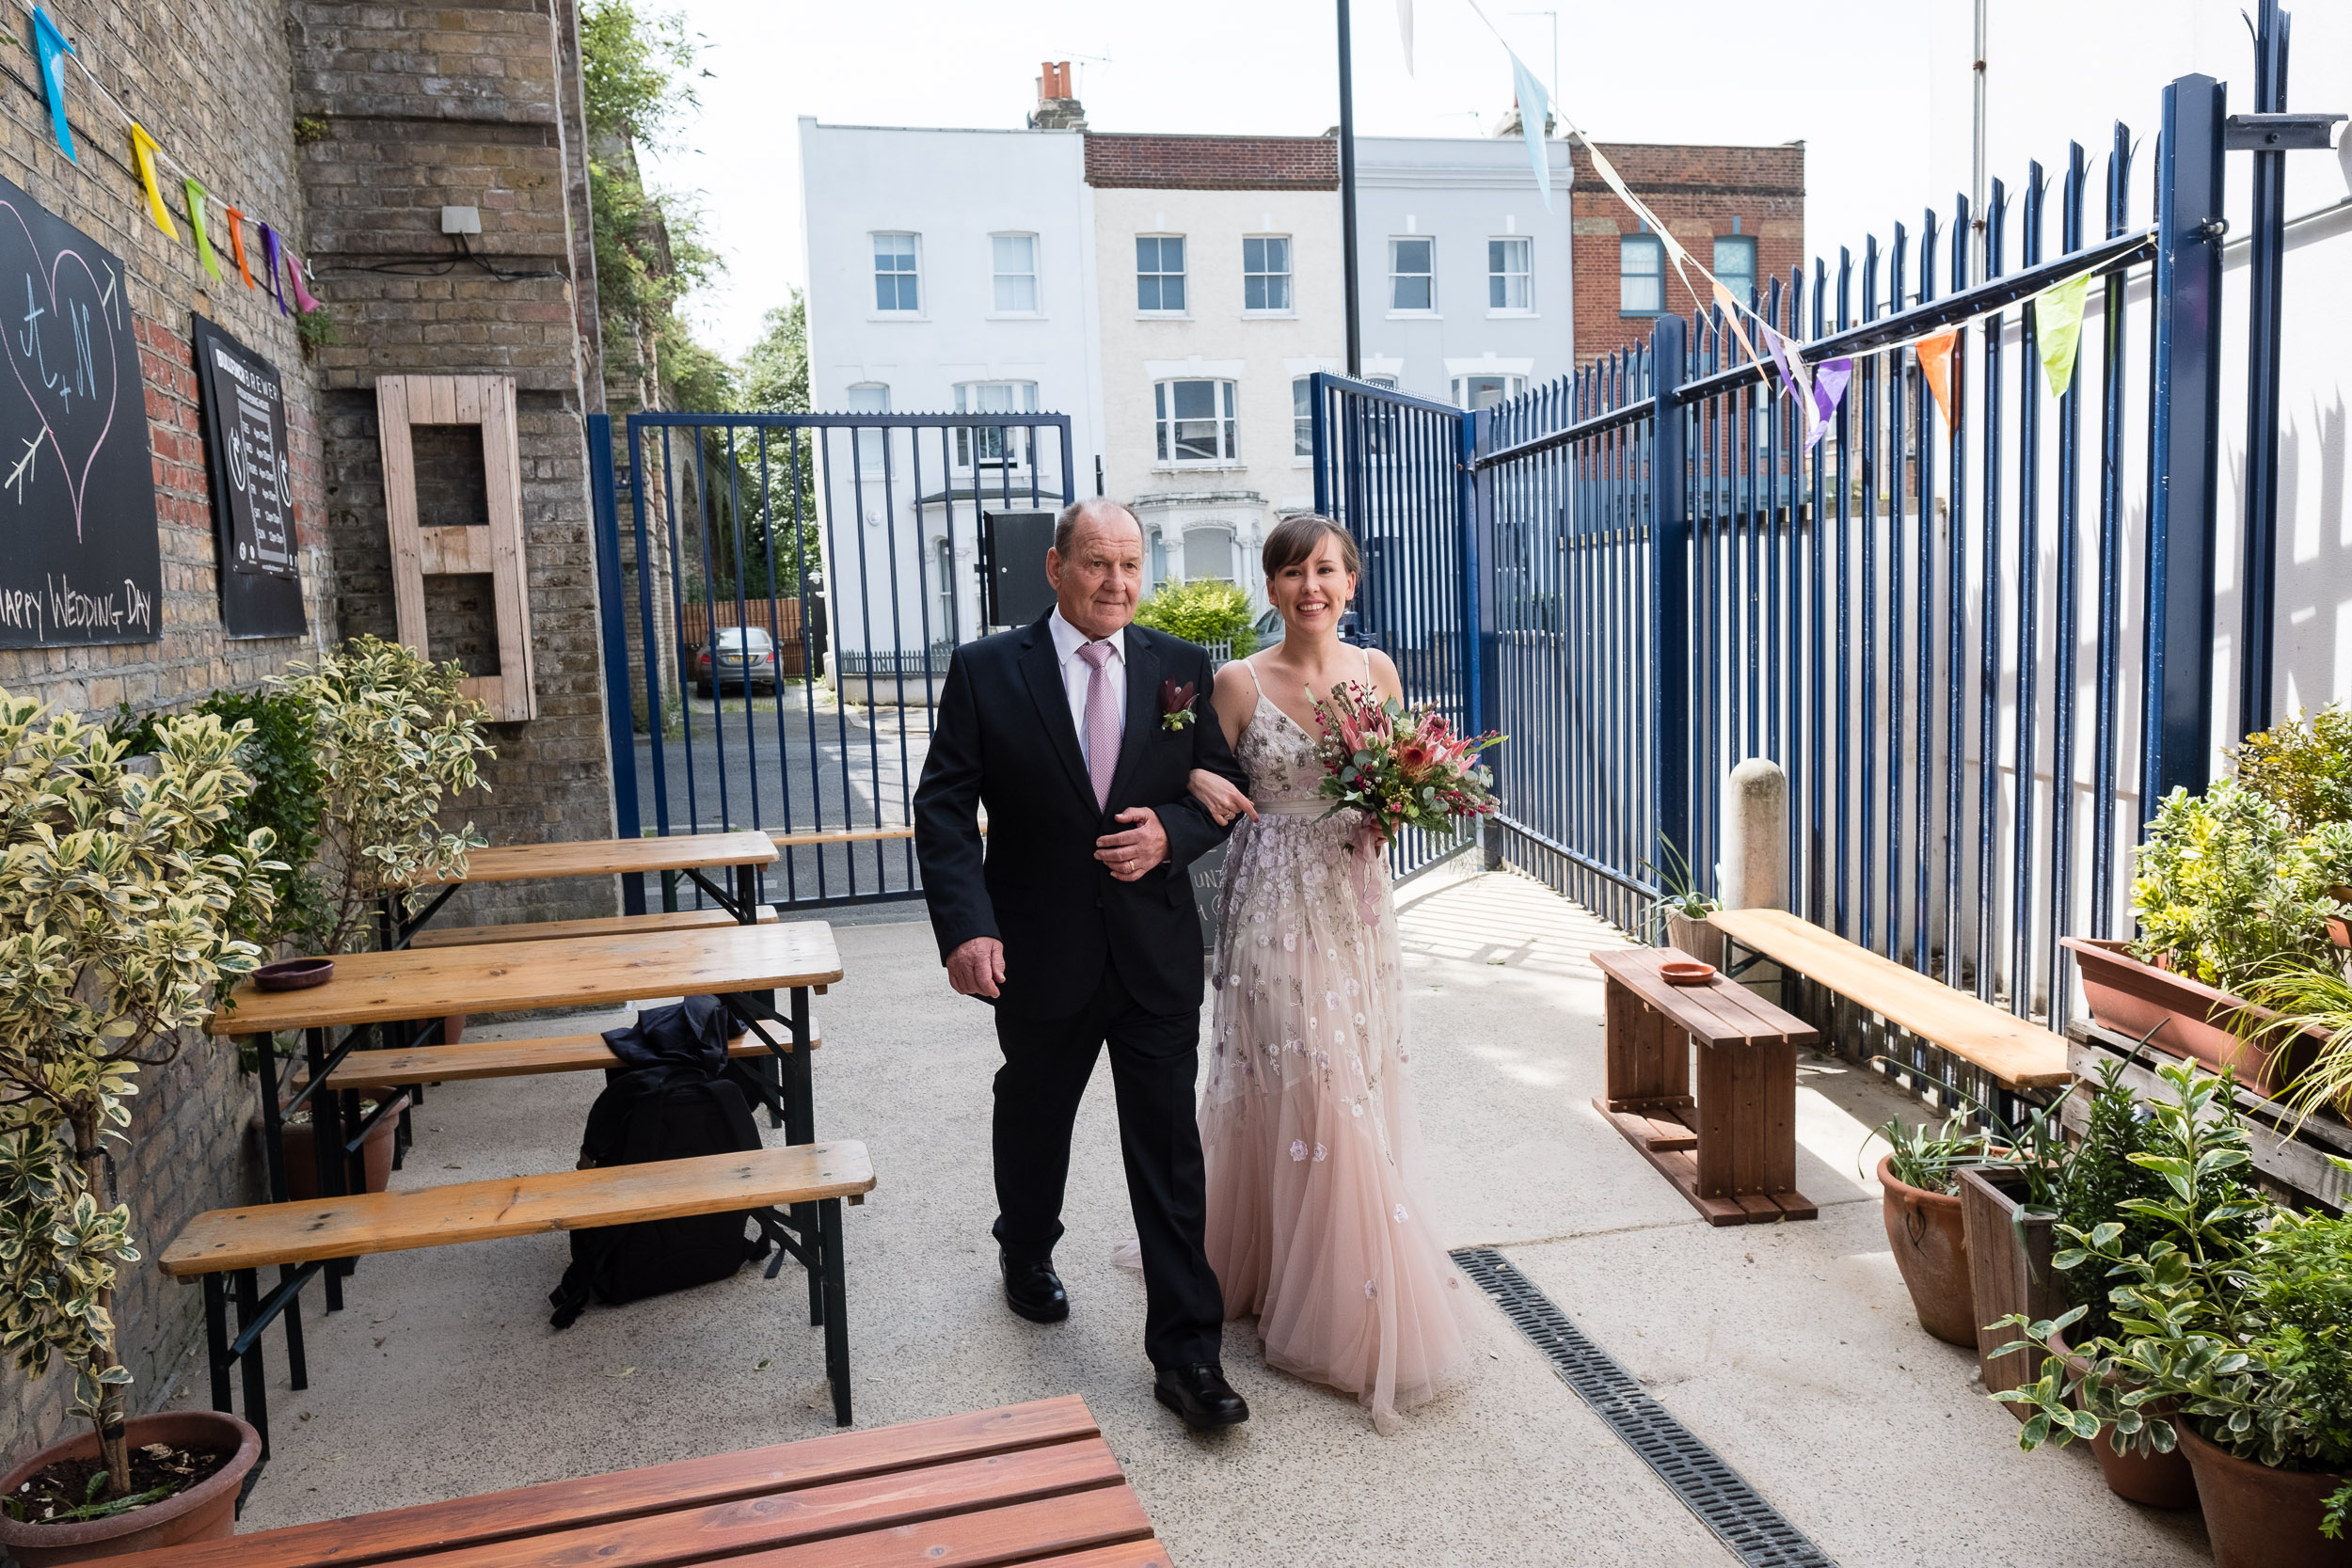 brockwell-lido-brixton-herne-hill-wedding-040.jpg